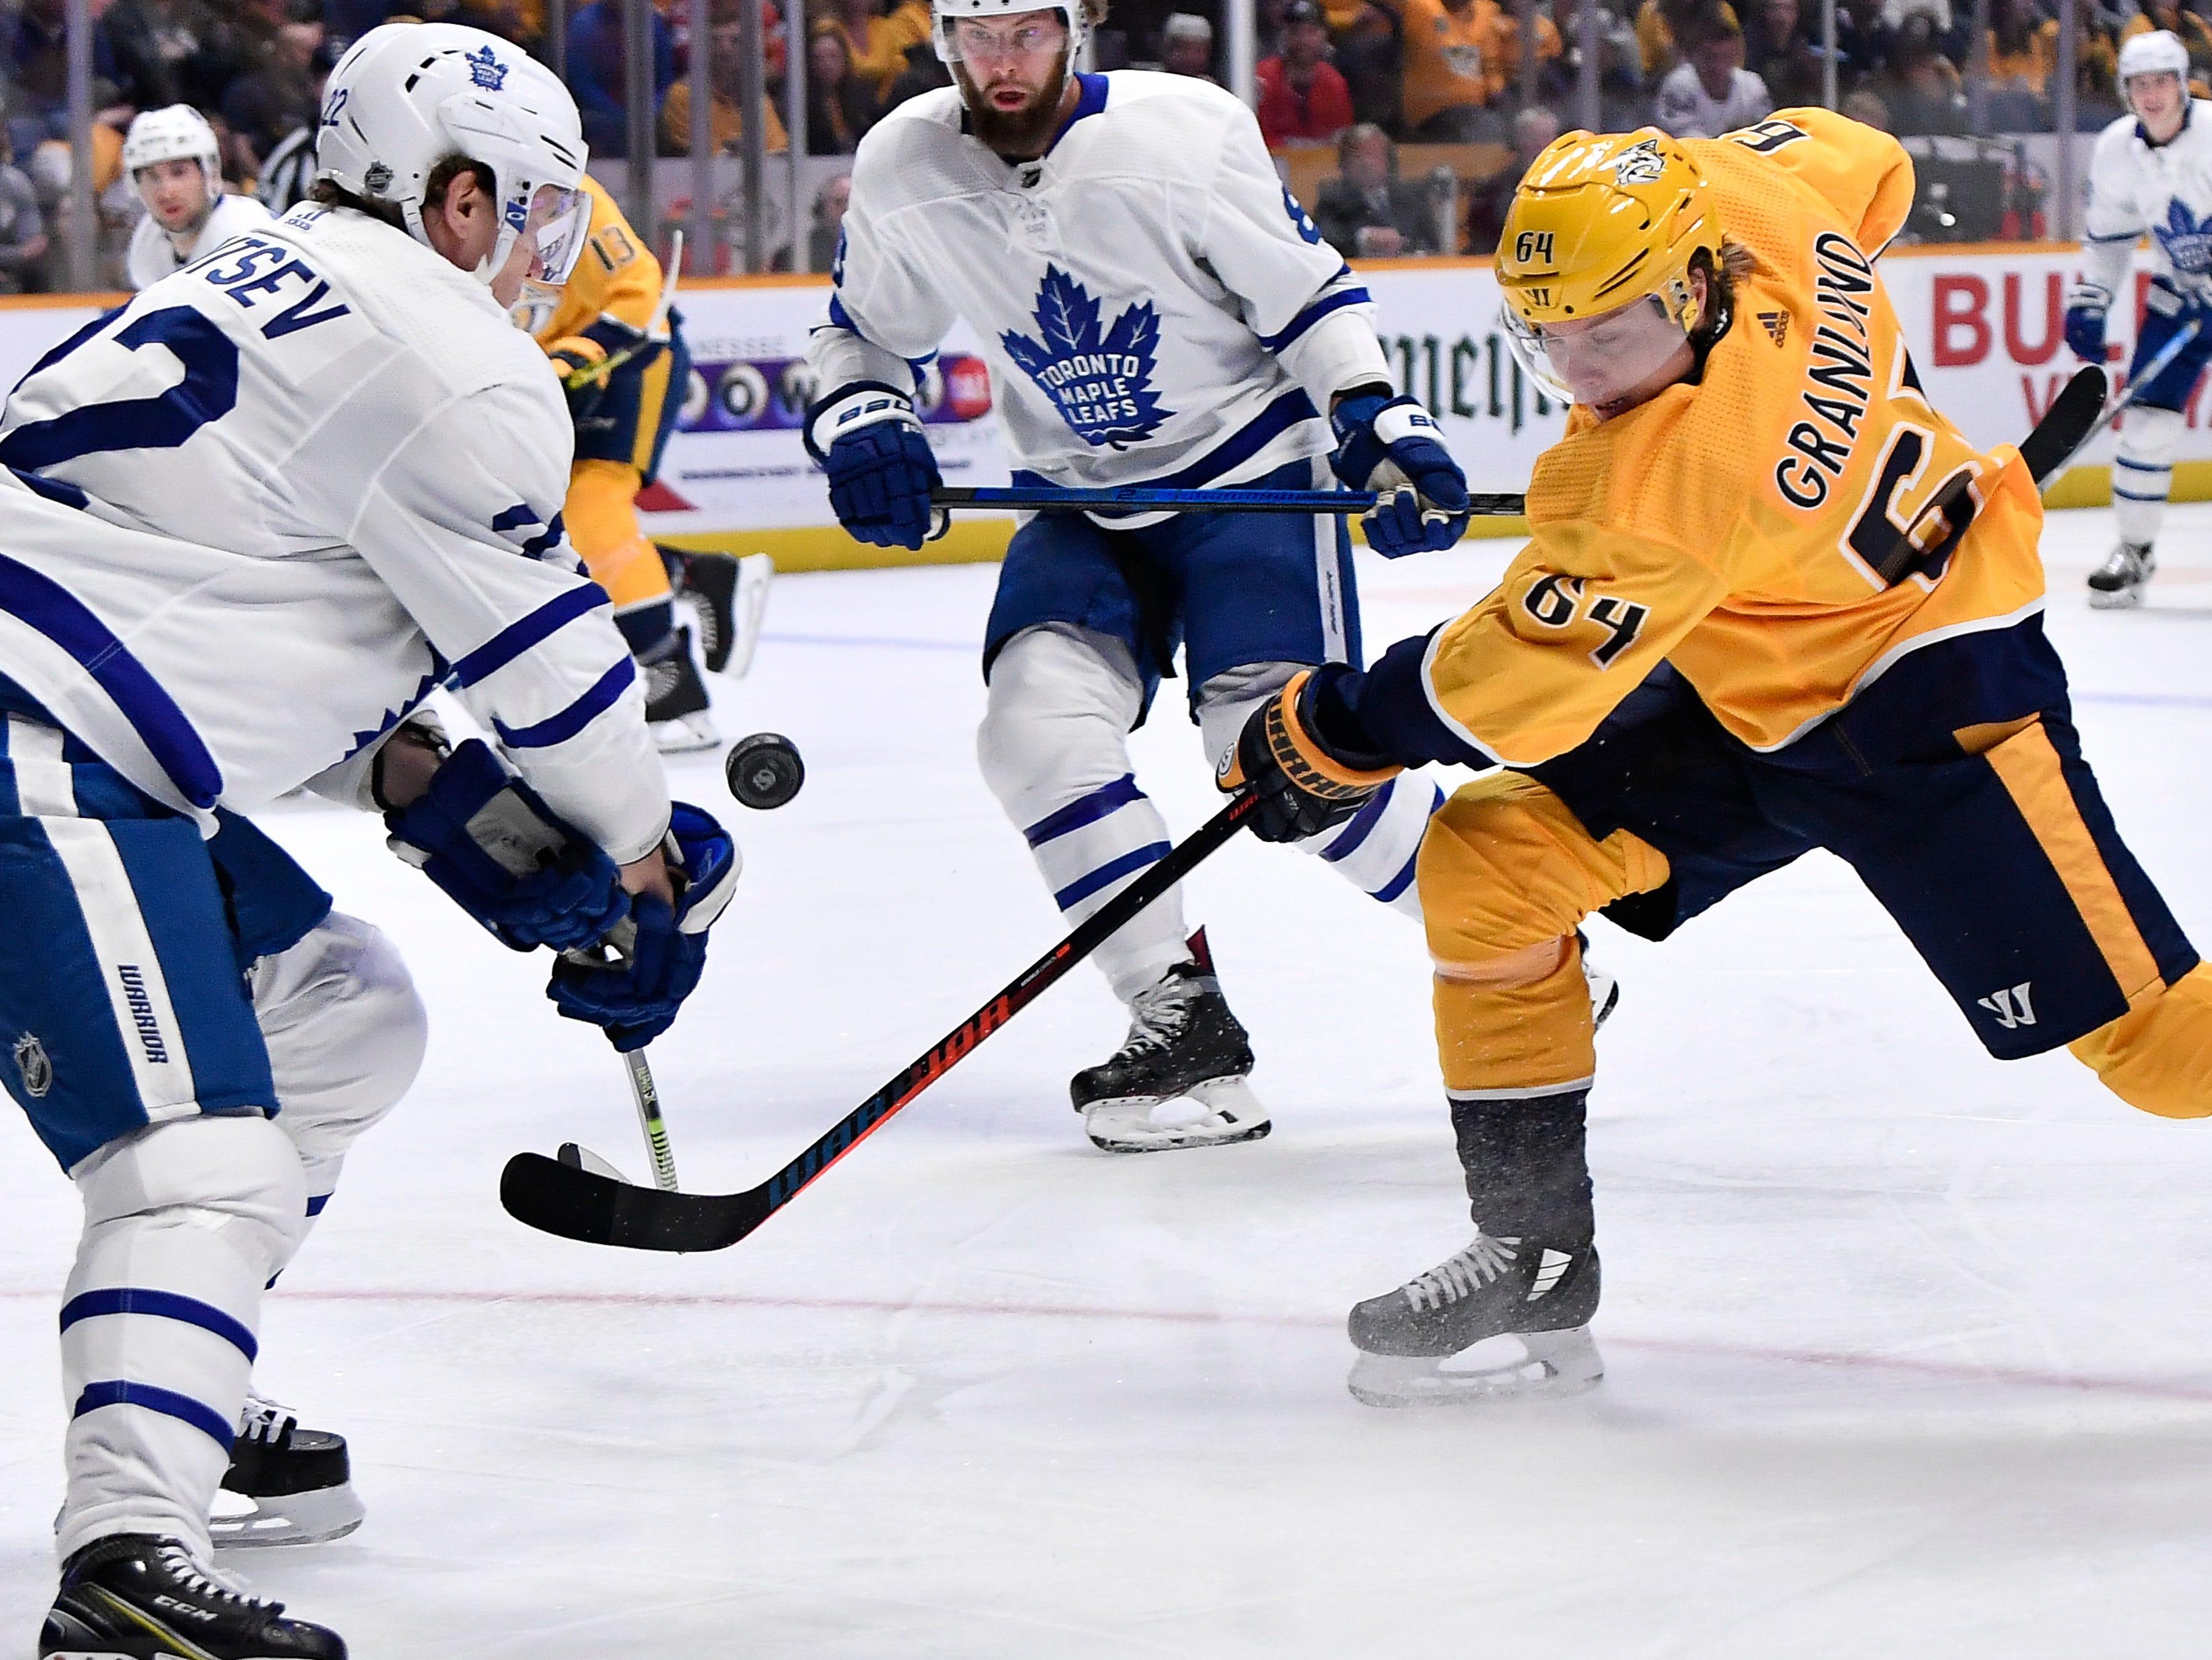 Predators center Mikael Granlund (64) tries to shot past Maple Leafs defenseman Nikita Zaitsev (22) during the first period at Bridgestone Arena Tuesday, March 19, 2019 in Nashville, Tenn.